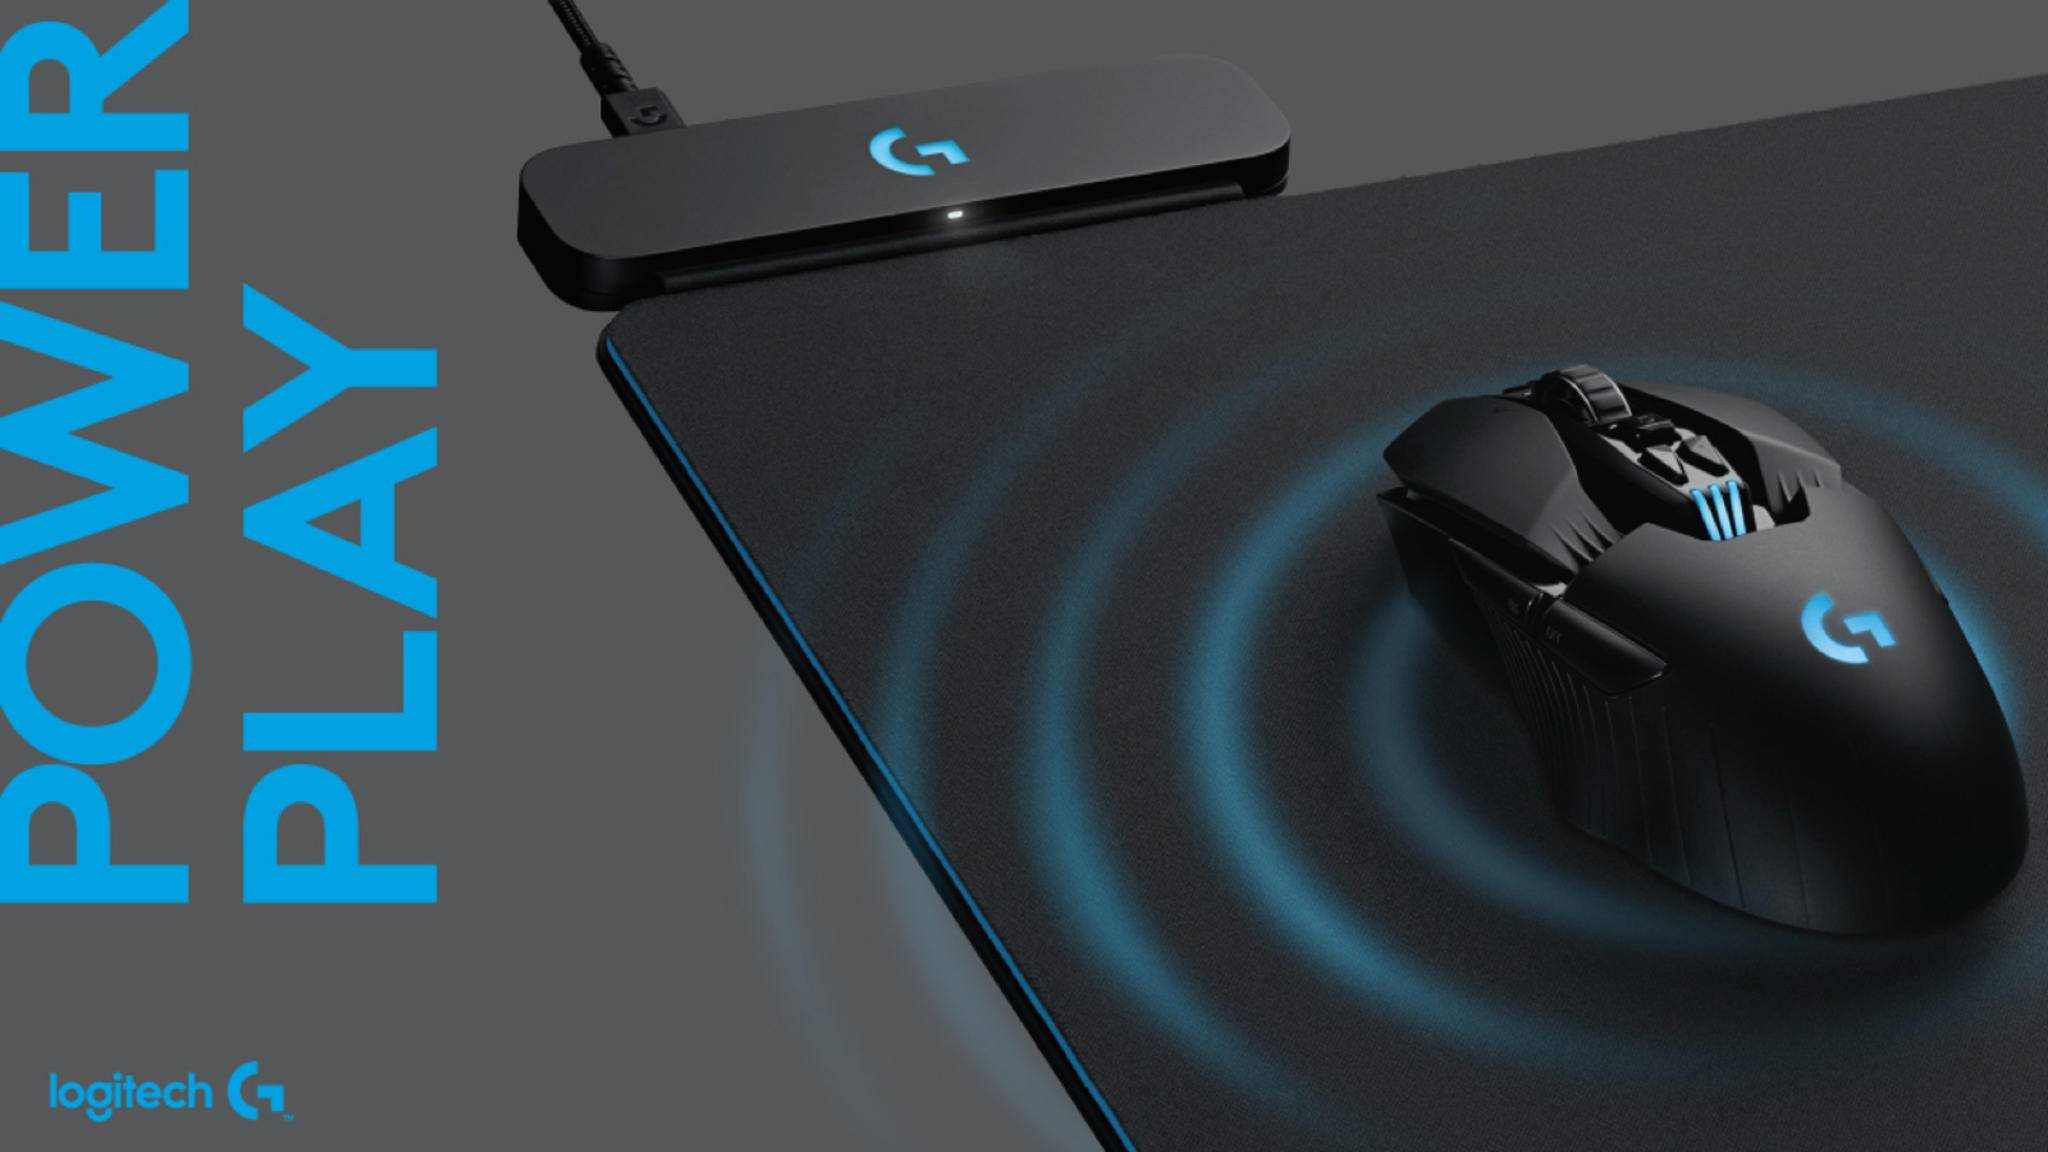 Logitech Powerplay G: Drahtloses Mousepad